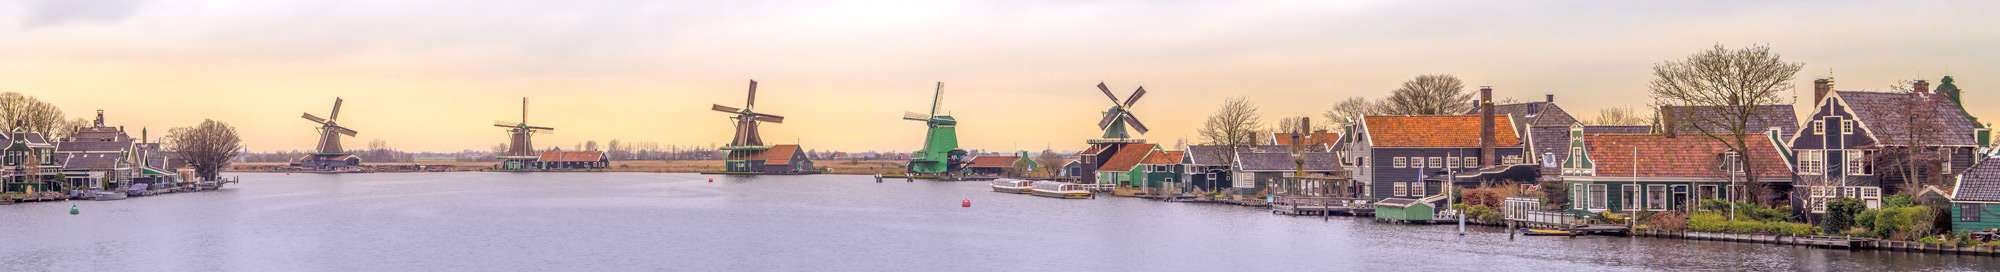 Weekendje weg in Alkmaar